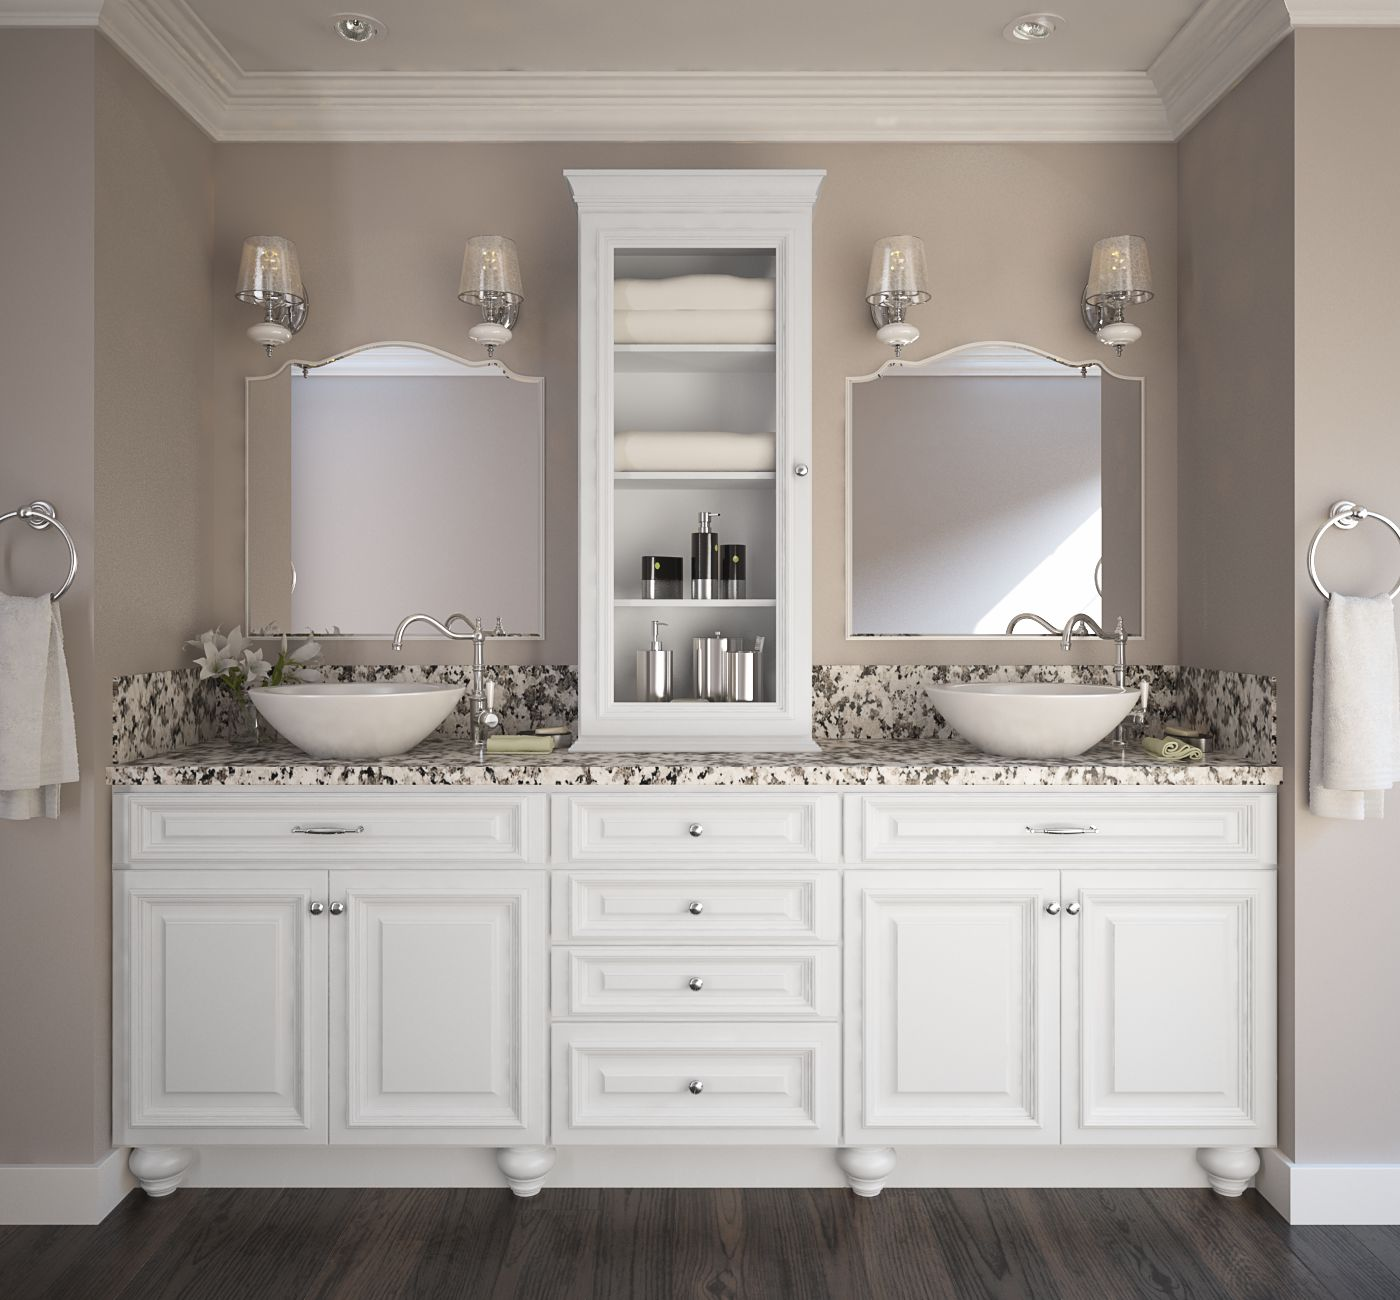 Roosevelt White Pre-Assembled Bathroom Vanities